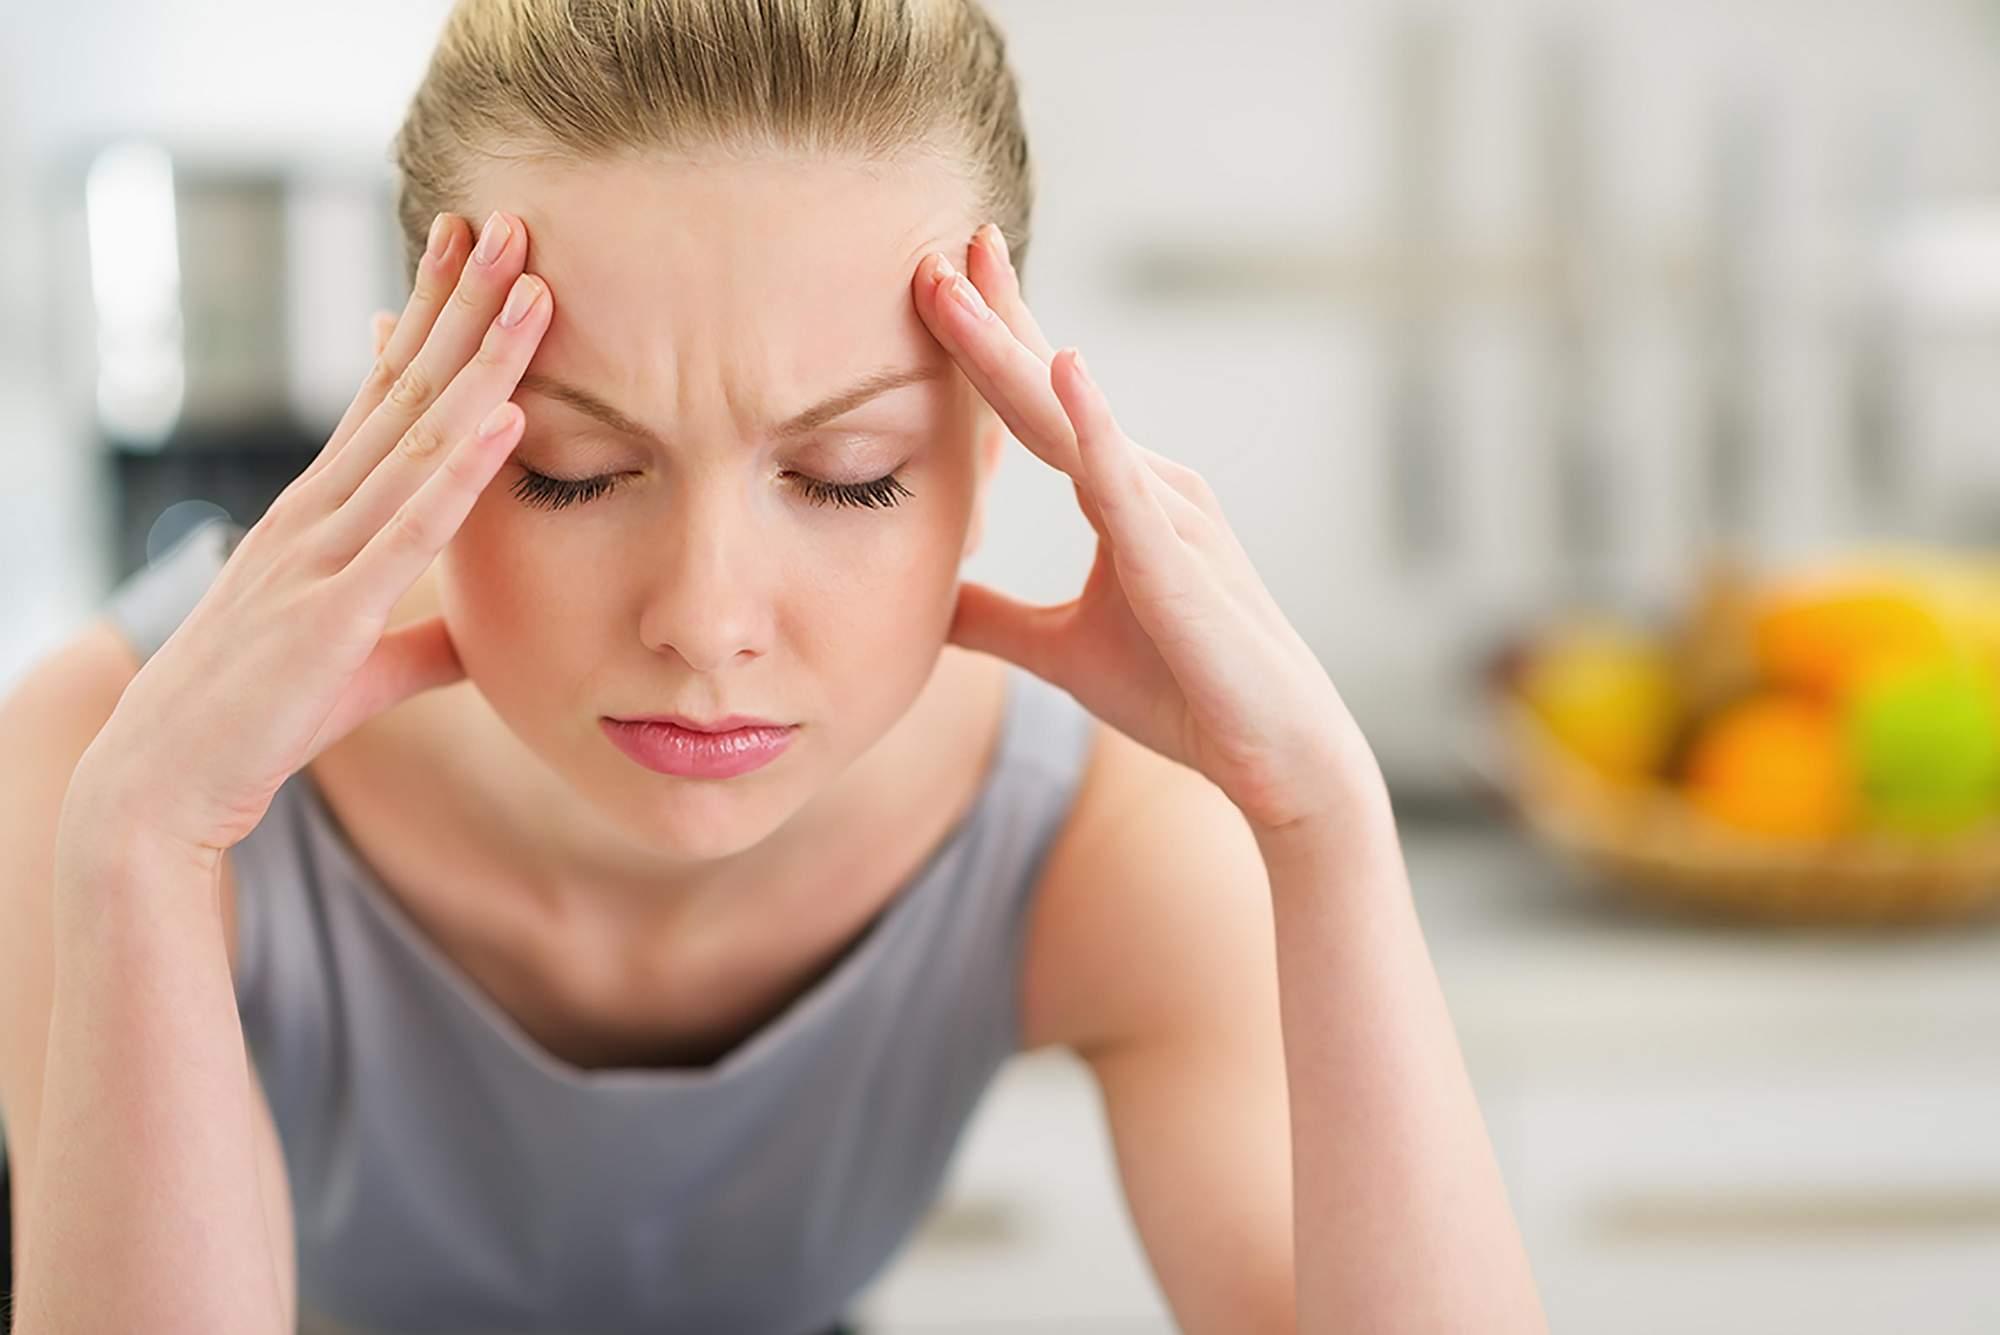 sindrome-meniere-mulheres-homens